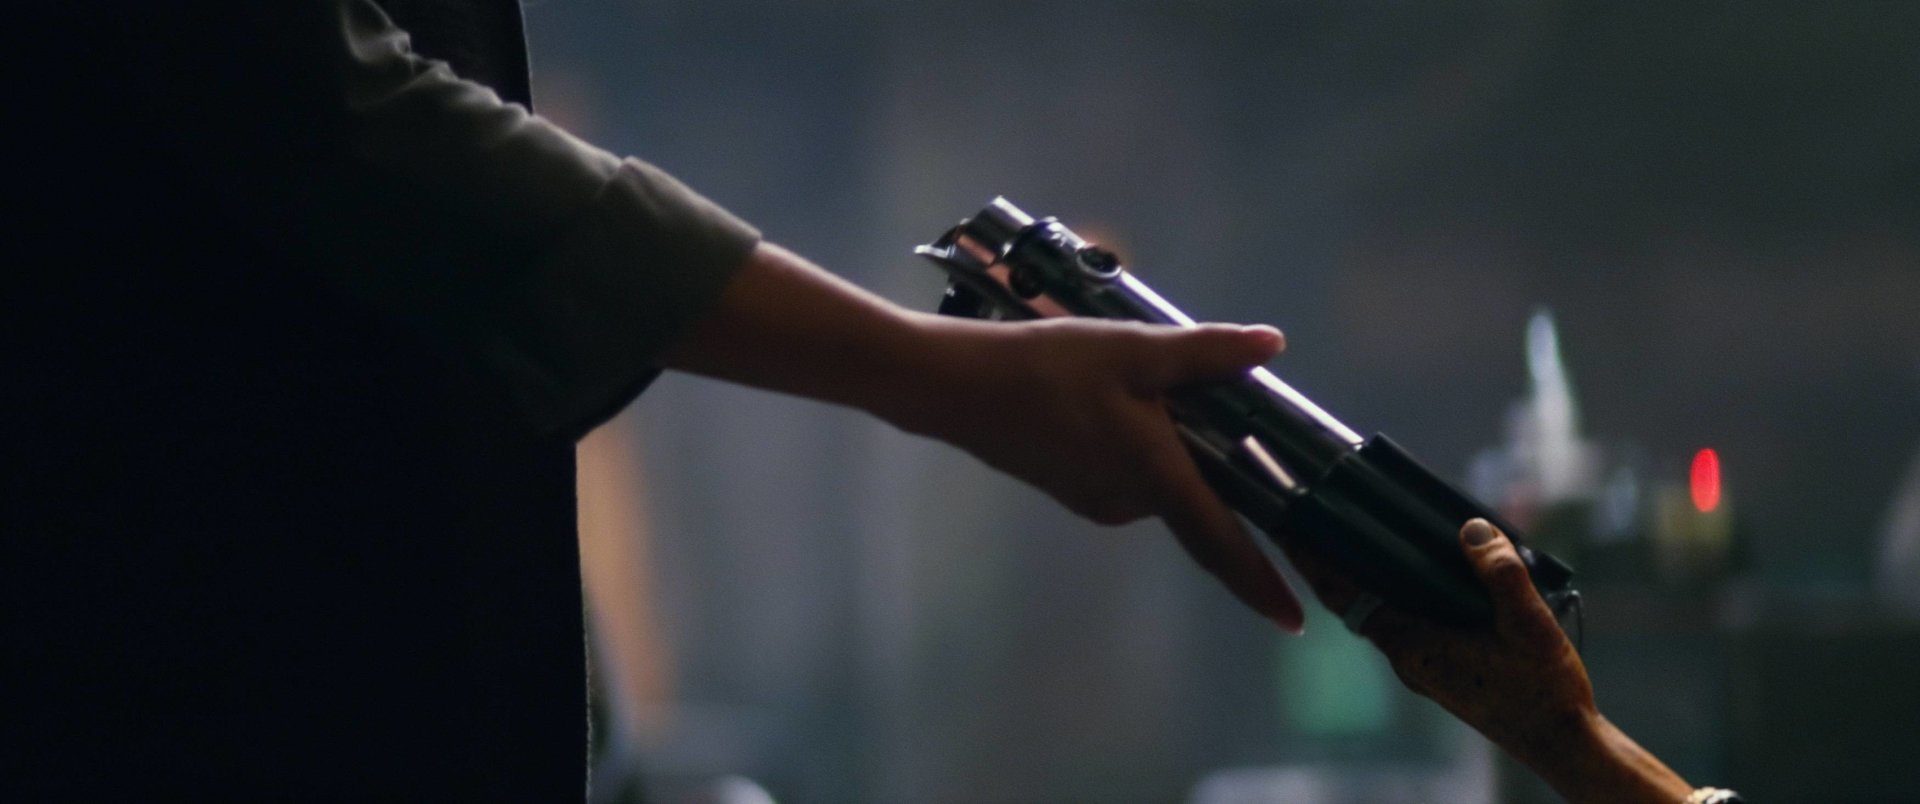 Movie - Star Wars Episode VII: The Force Awakens  Lightsaber Wallpaper